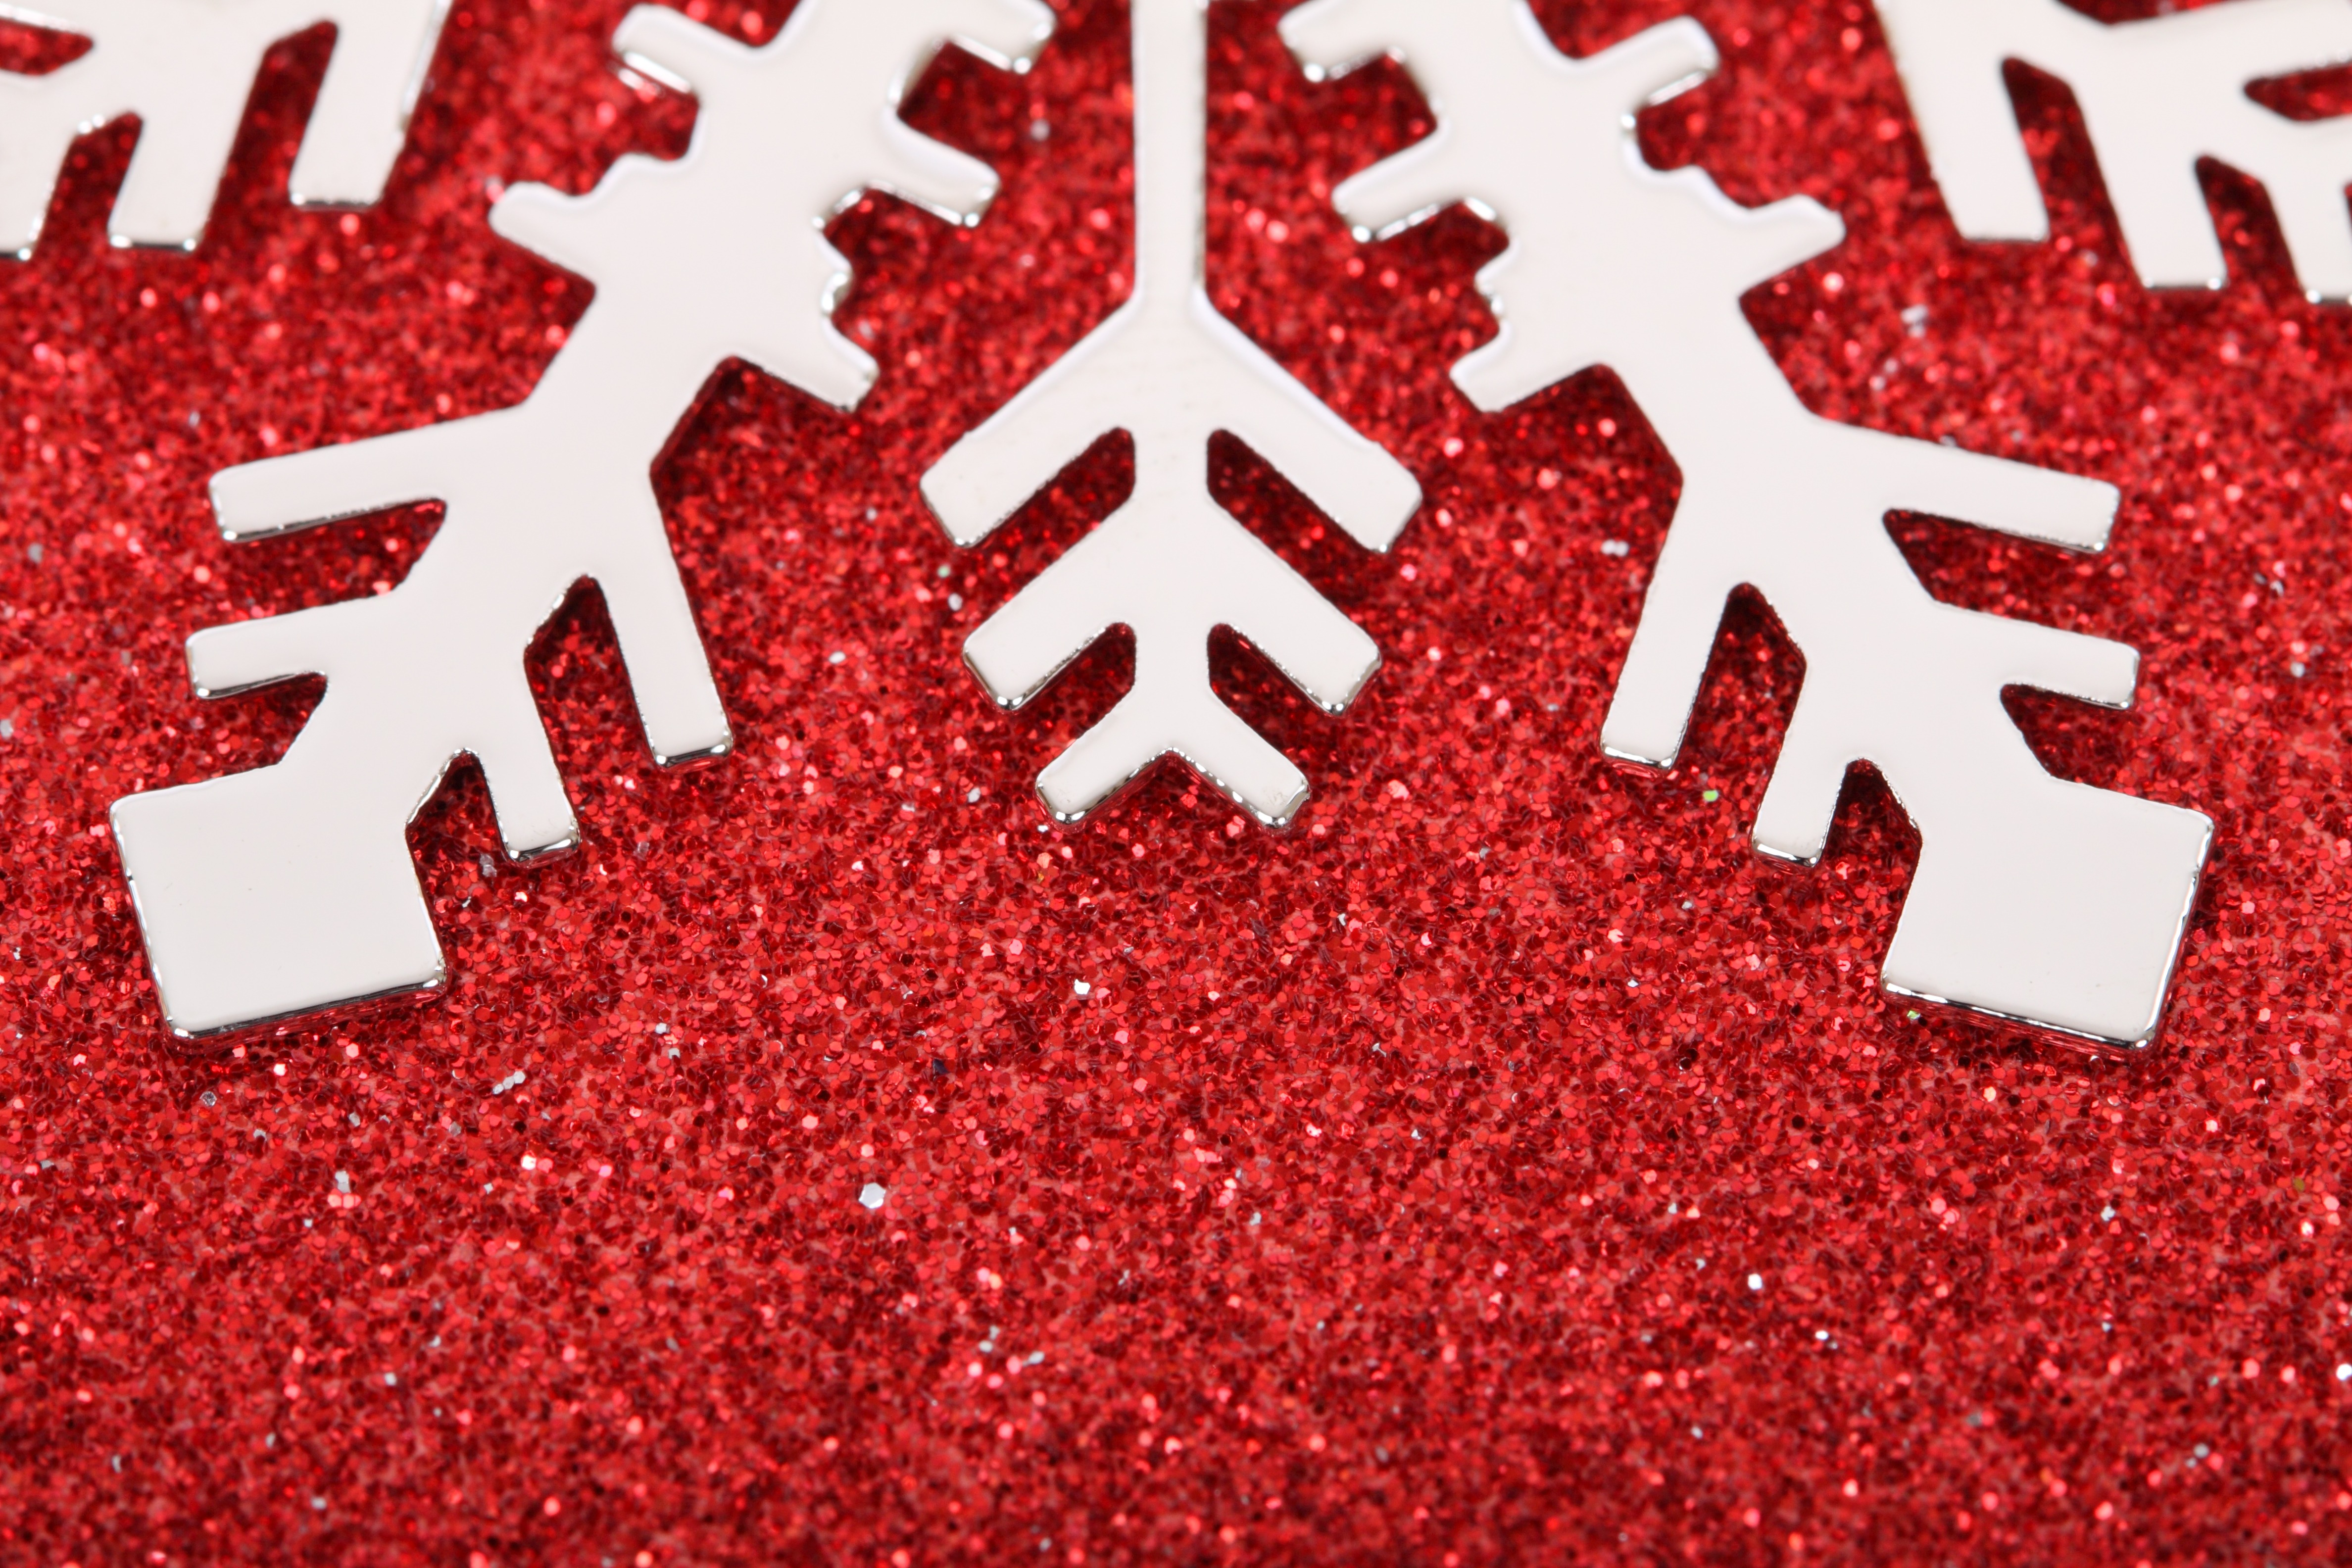 ventas navideñas